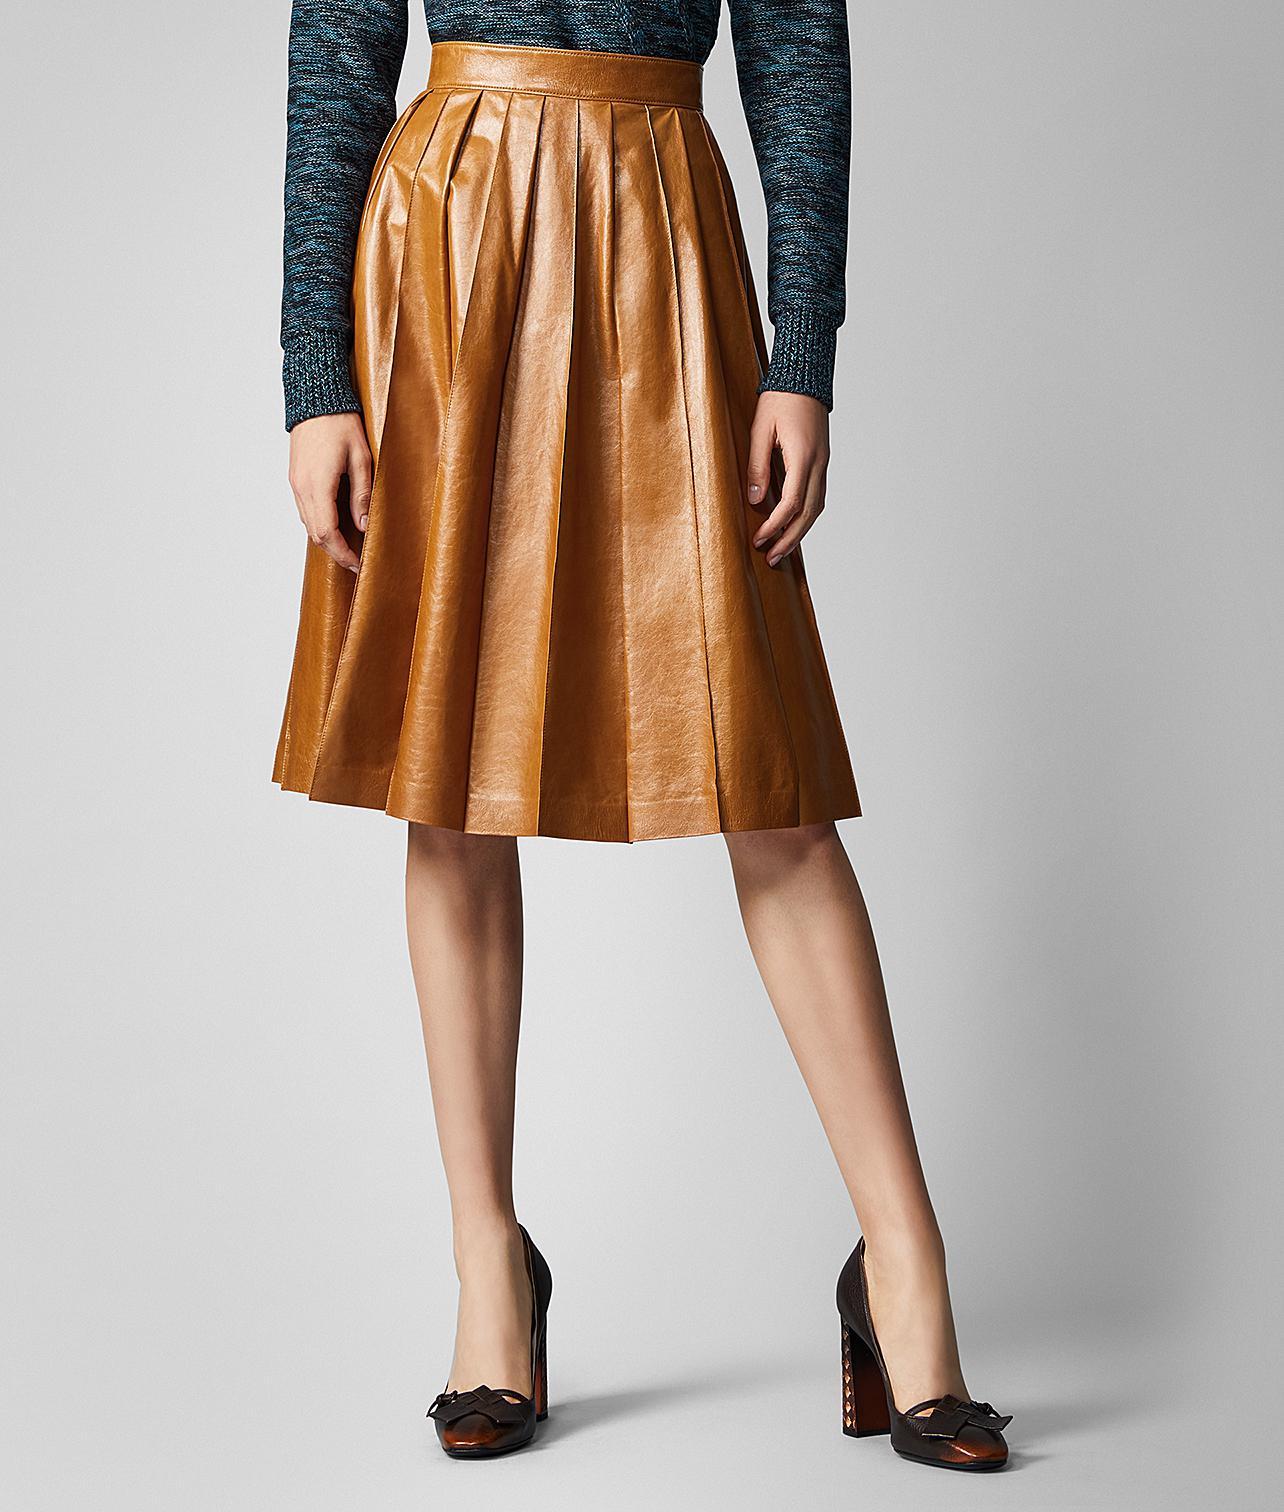 f86a868eb Bottega Veneta Shiny Pleated Leather Skirt in Orange - Save 7% - Lyst